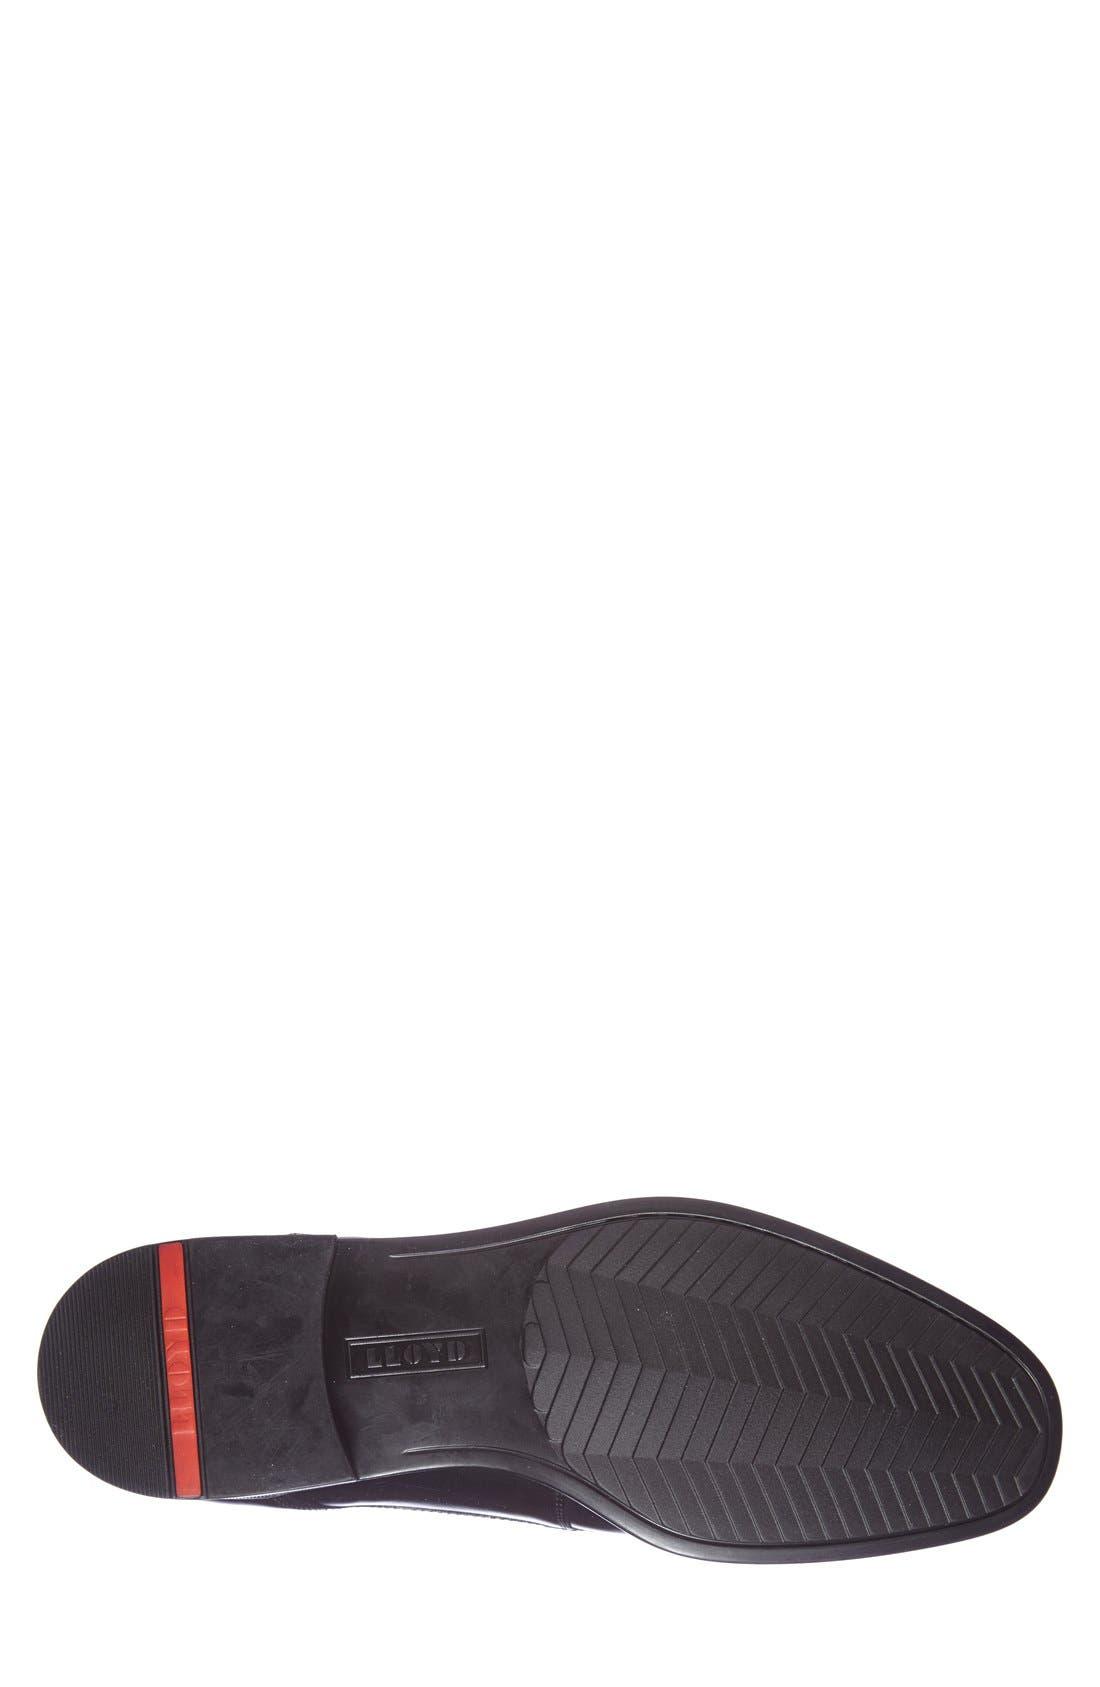 'Gildo' Plain Toe Derby,                             Alternate thumbnail 4, color,                             Black